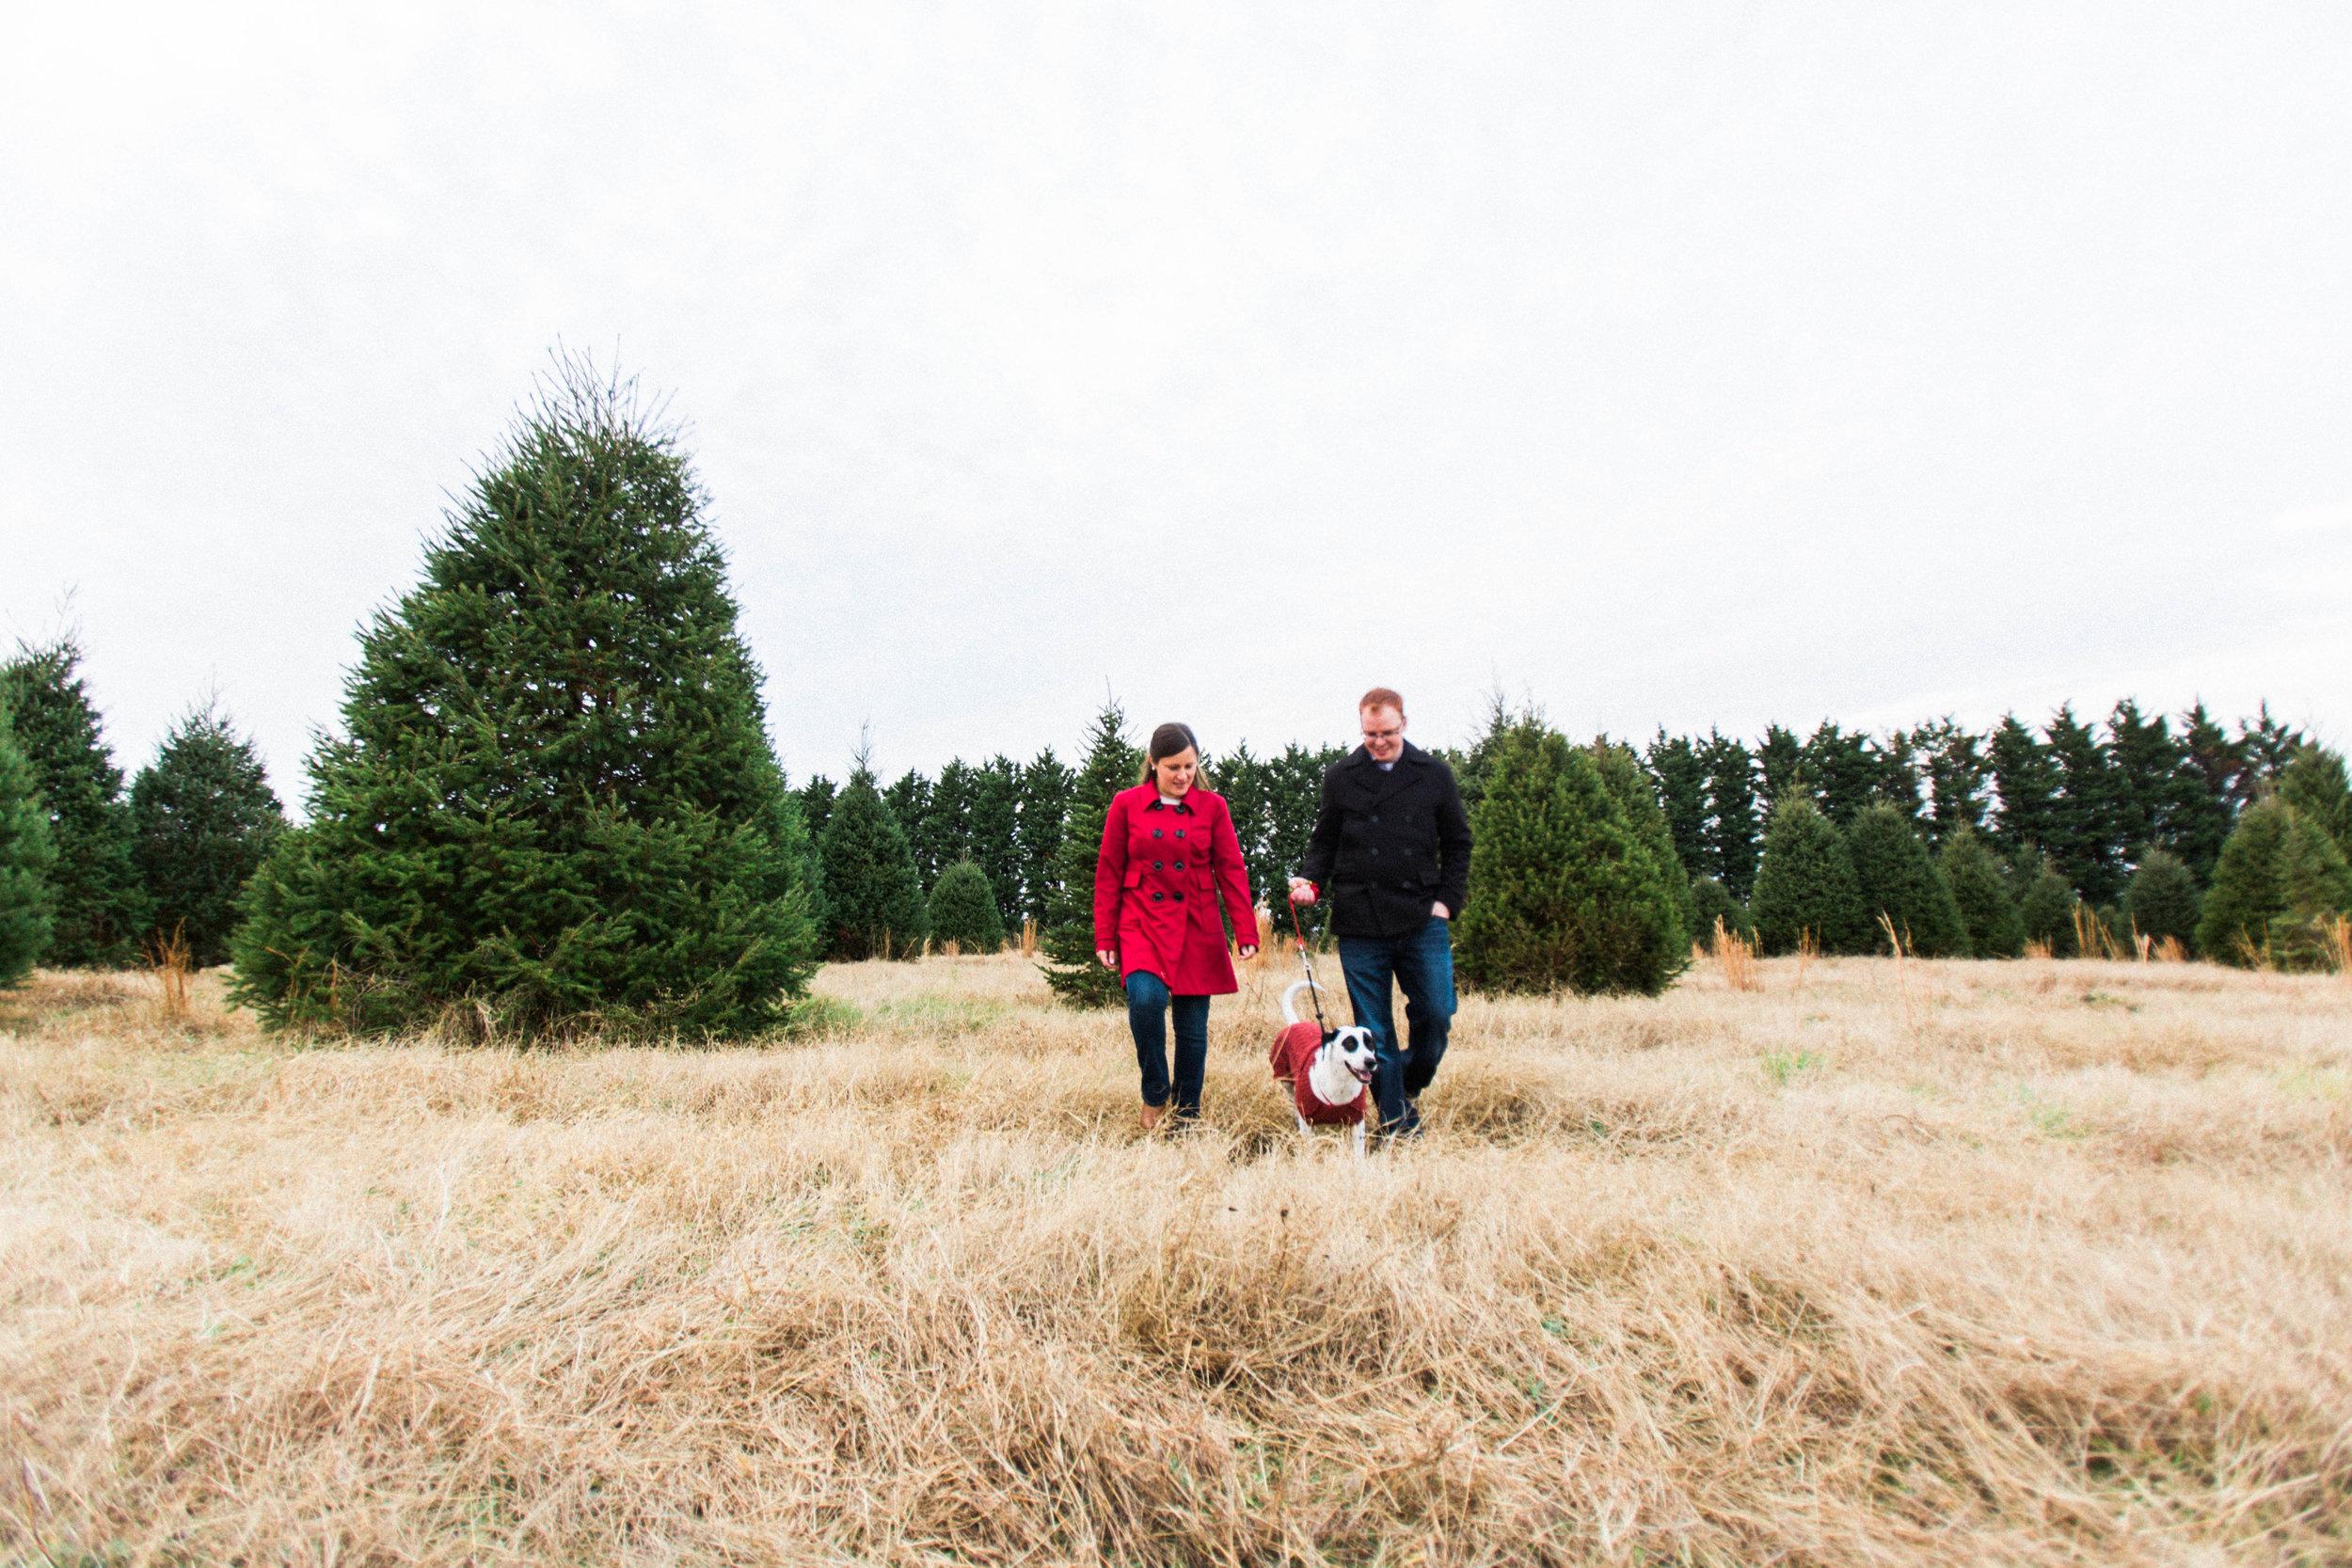 CHRISTMAS_TREE_FARM_ENGAGEMENT_PHOTOS--0140.jpg